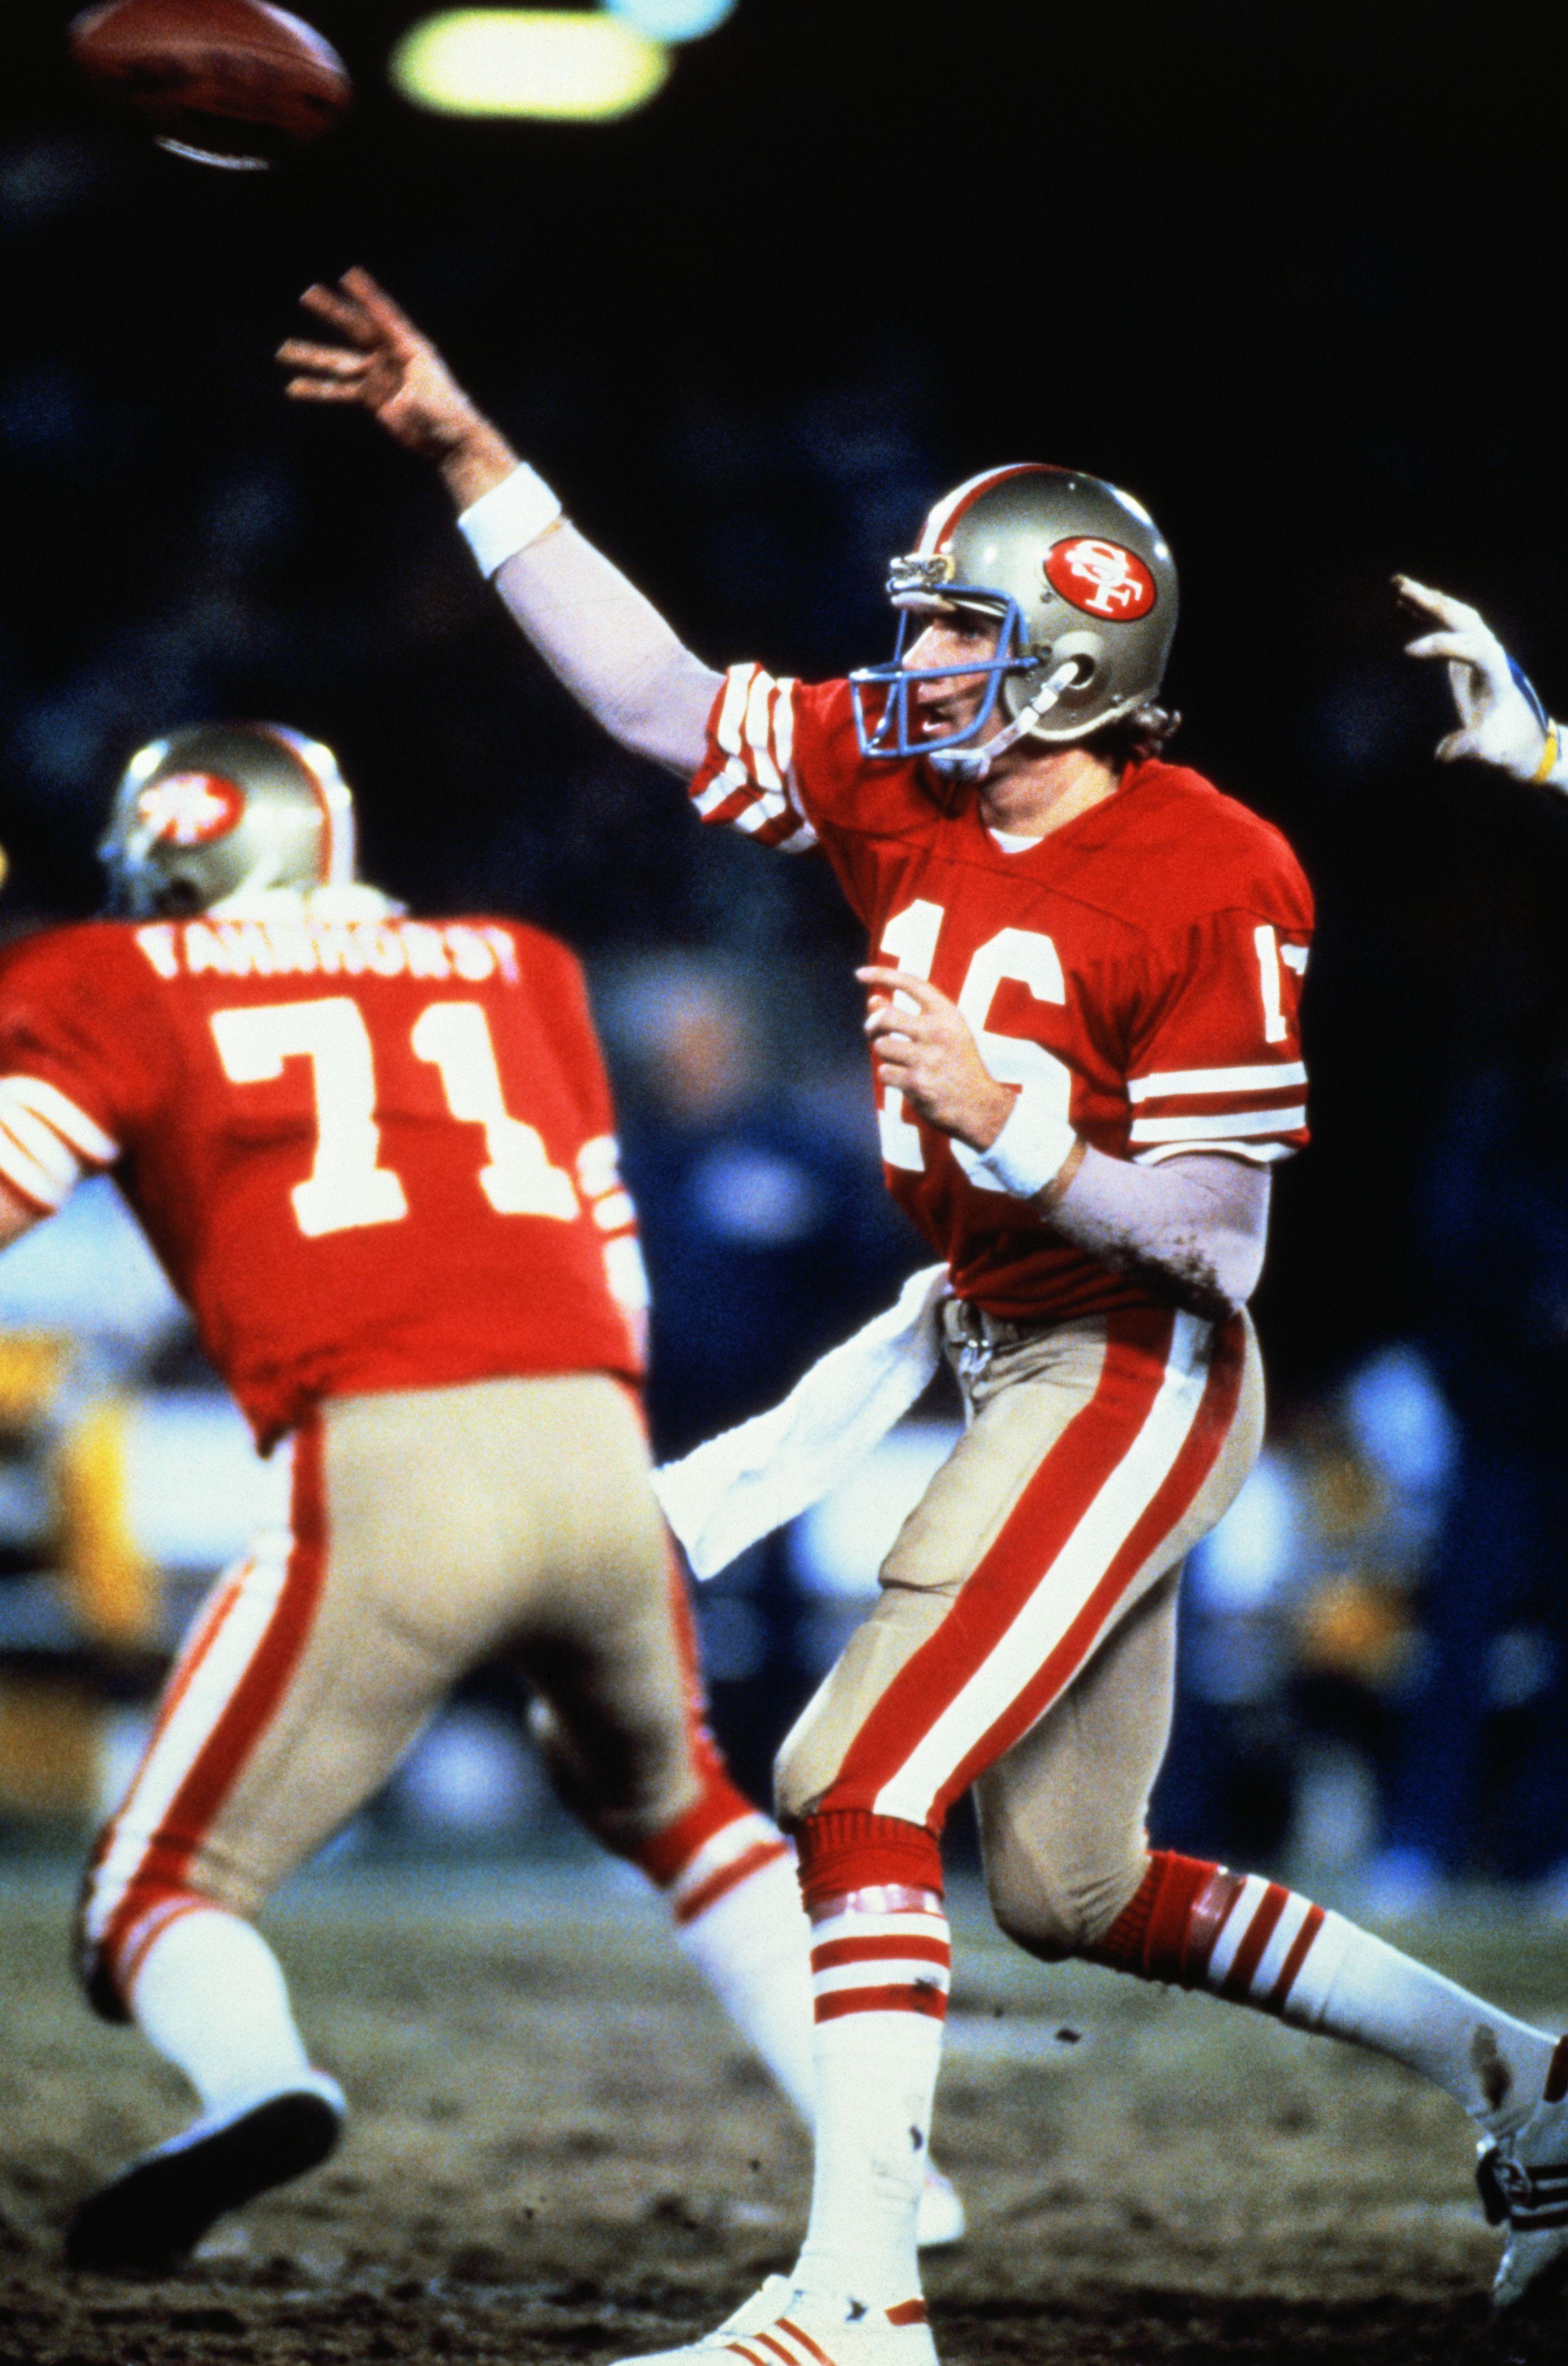 Discount joe montana throwing football Pennsylvania Pictures   NFL  hot sale